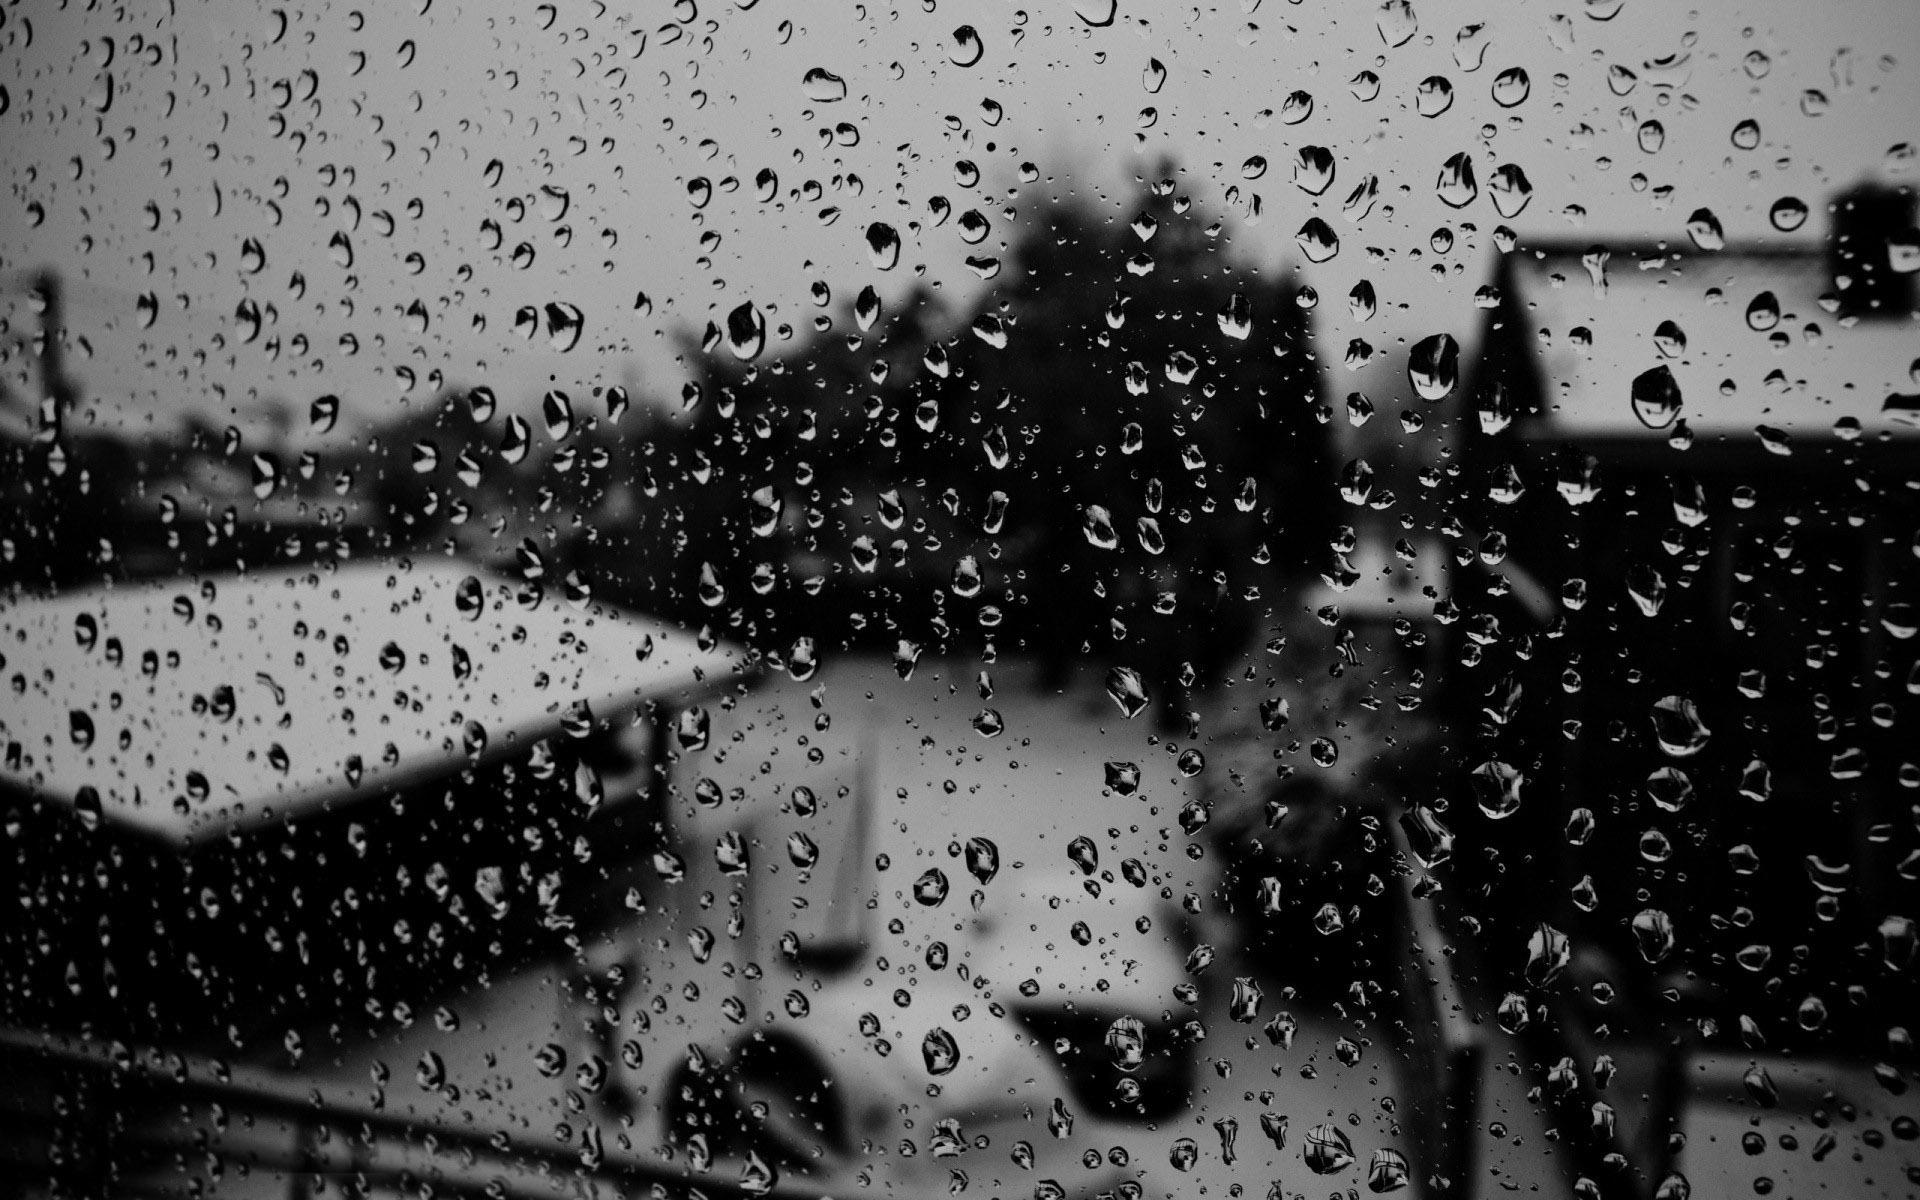 47 windows raindrops wallpaper on wallpapersafari - Rainy window wallpaper ...